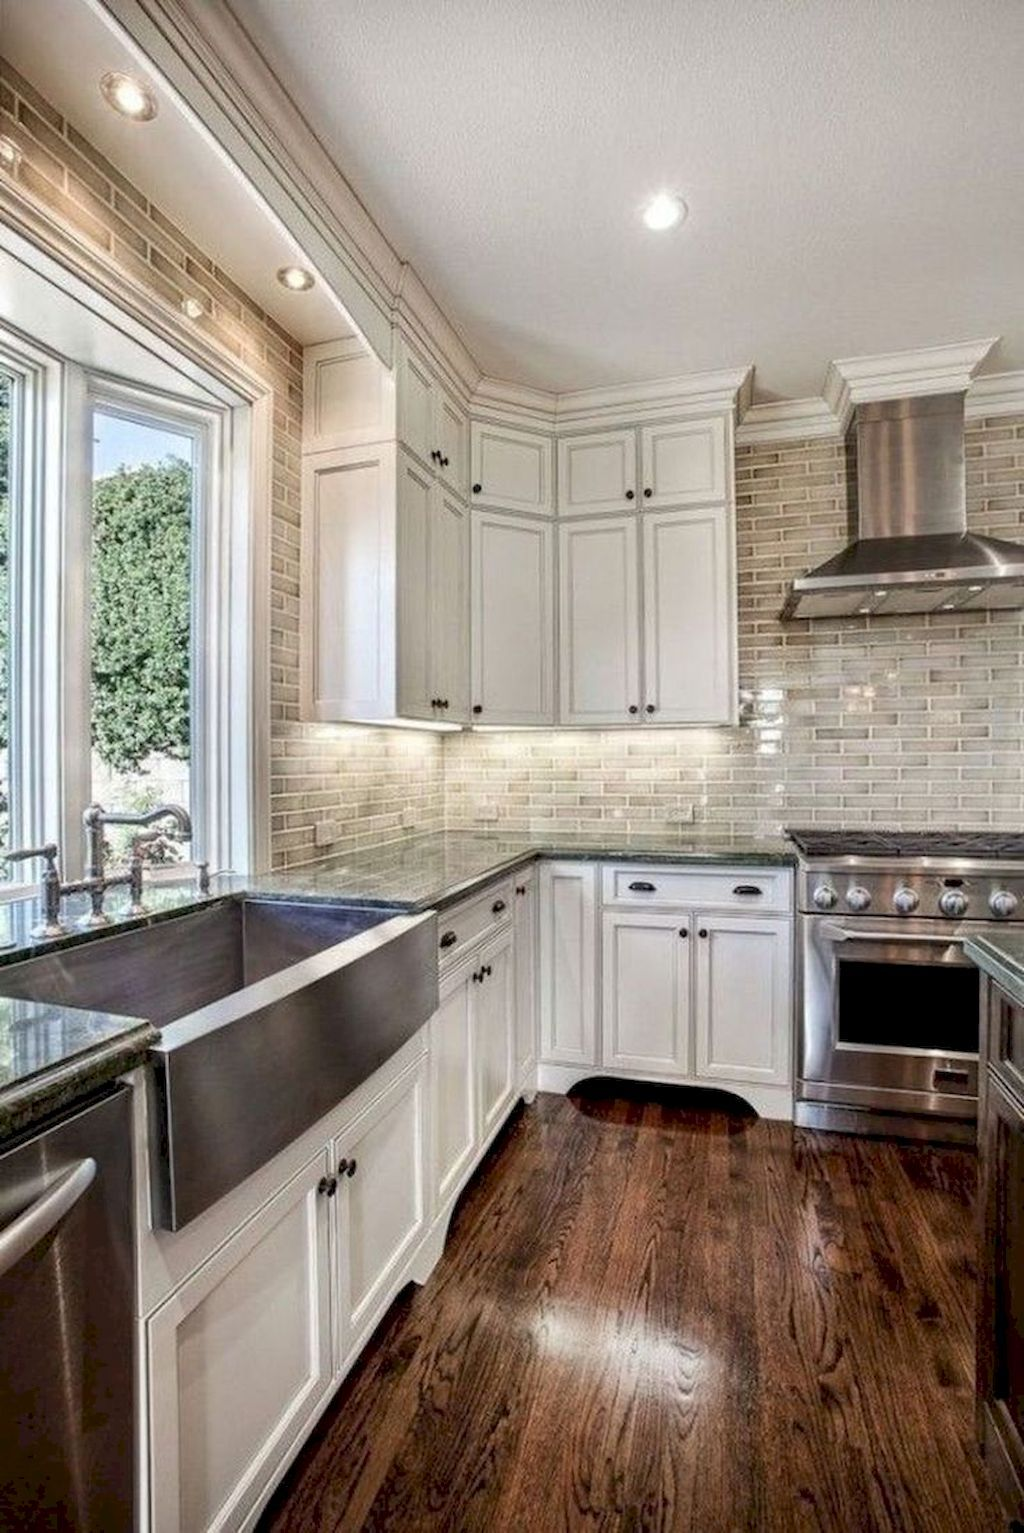 80 farmhouse kitchen backsplash design ideas kitchen remodel rh pinterest com